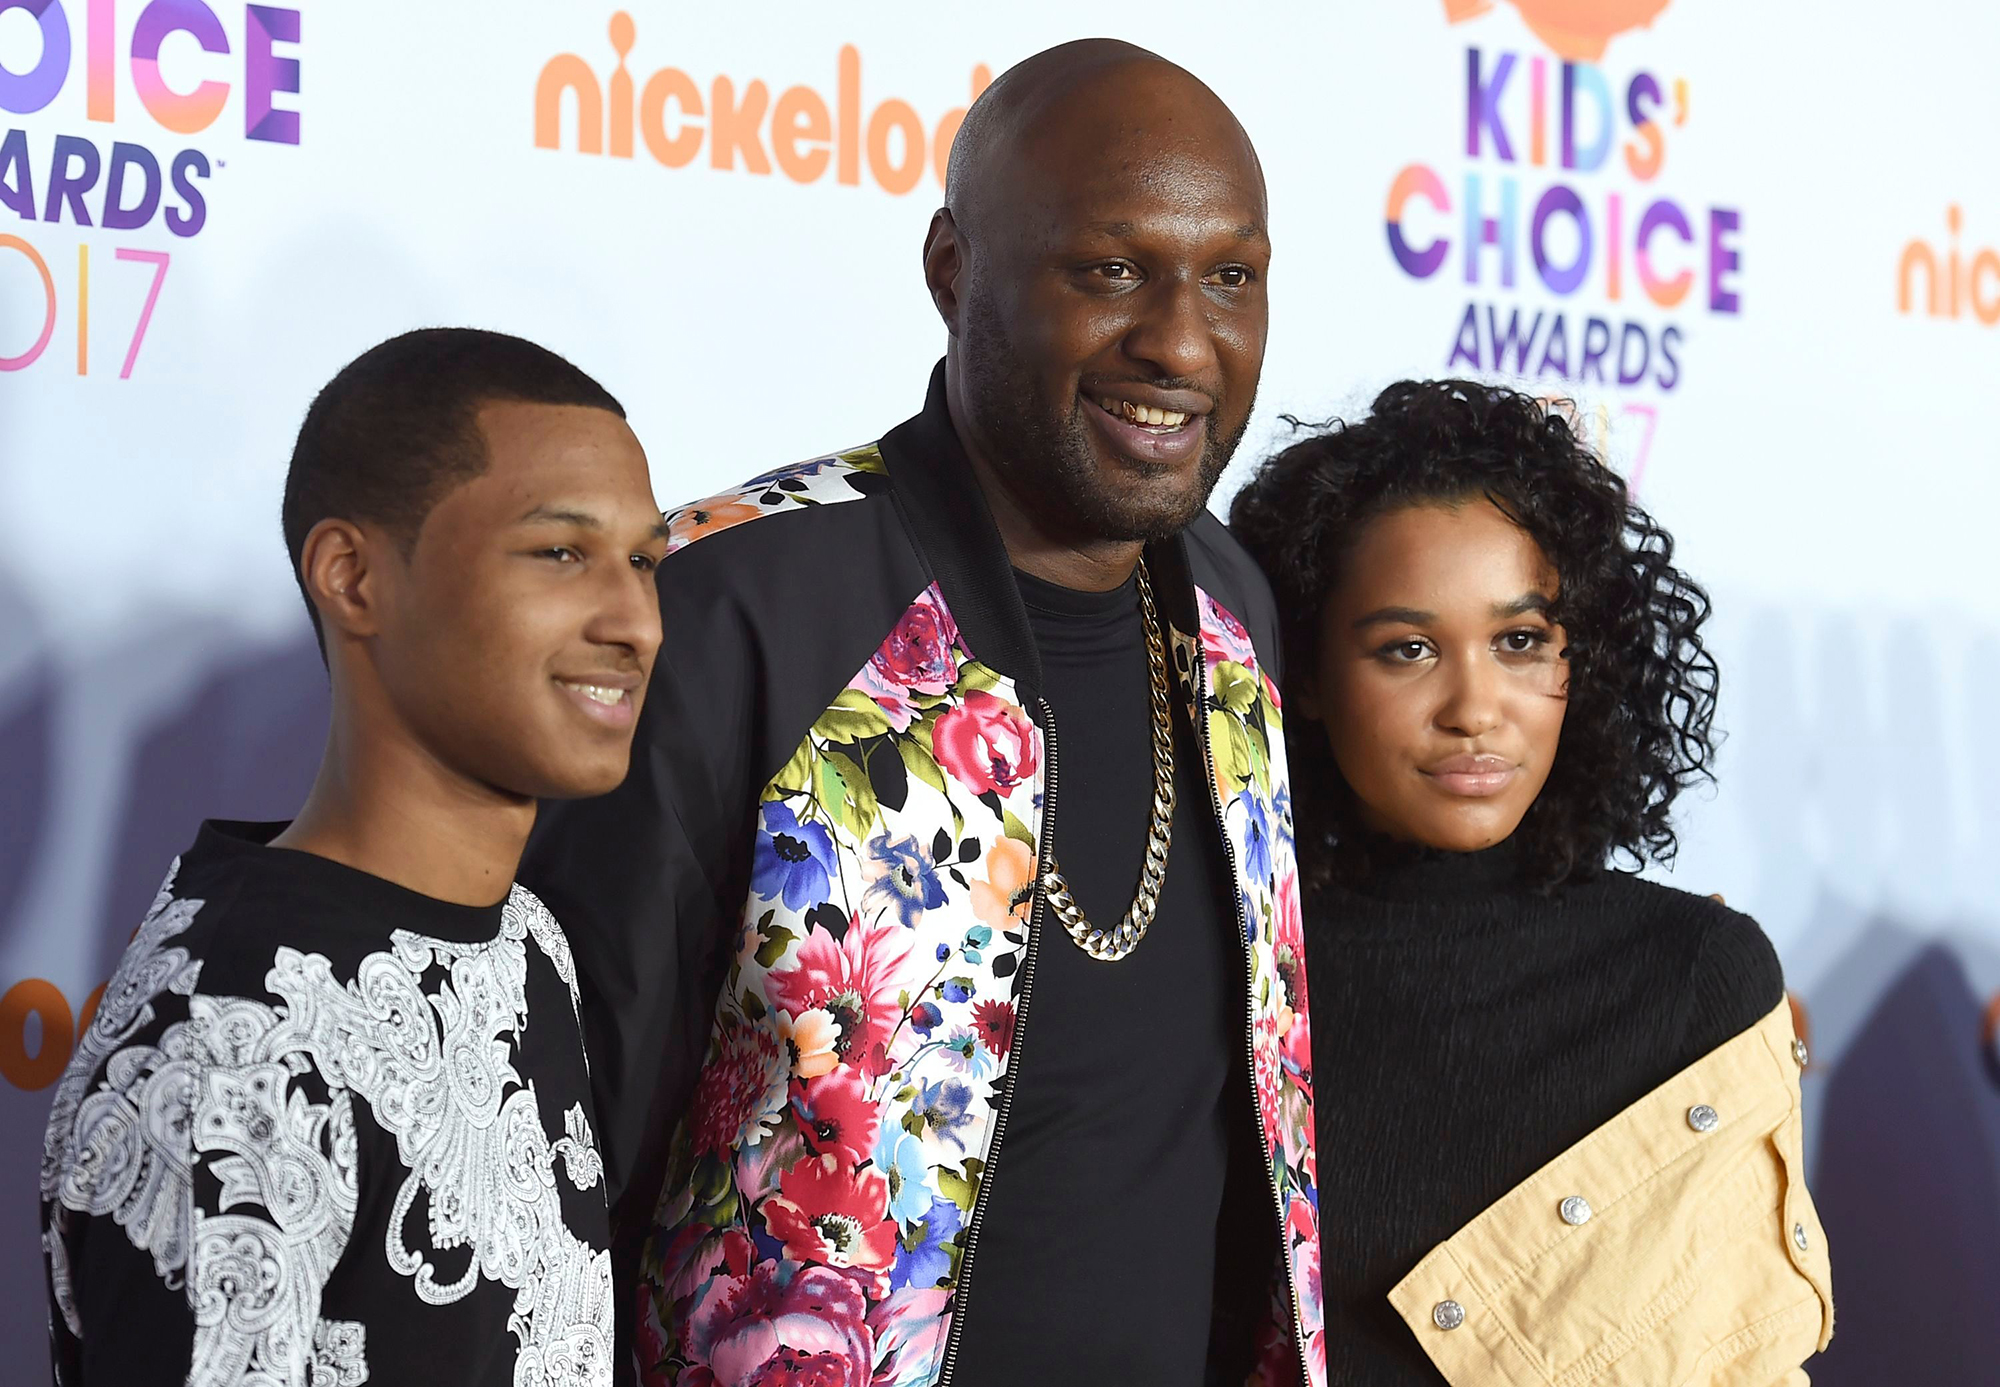 Lamar Odom and Kids